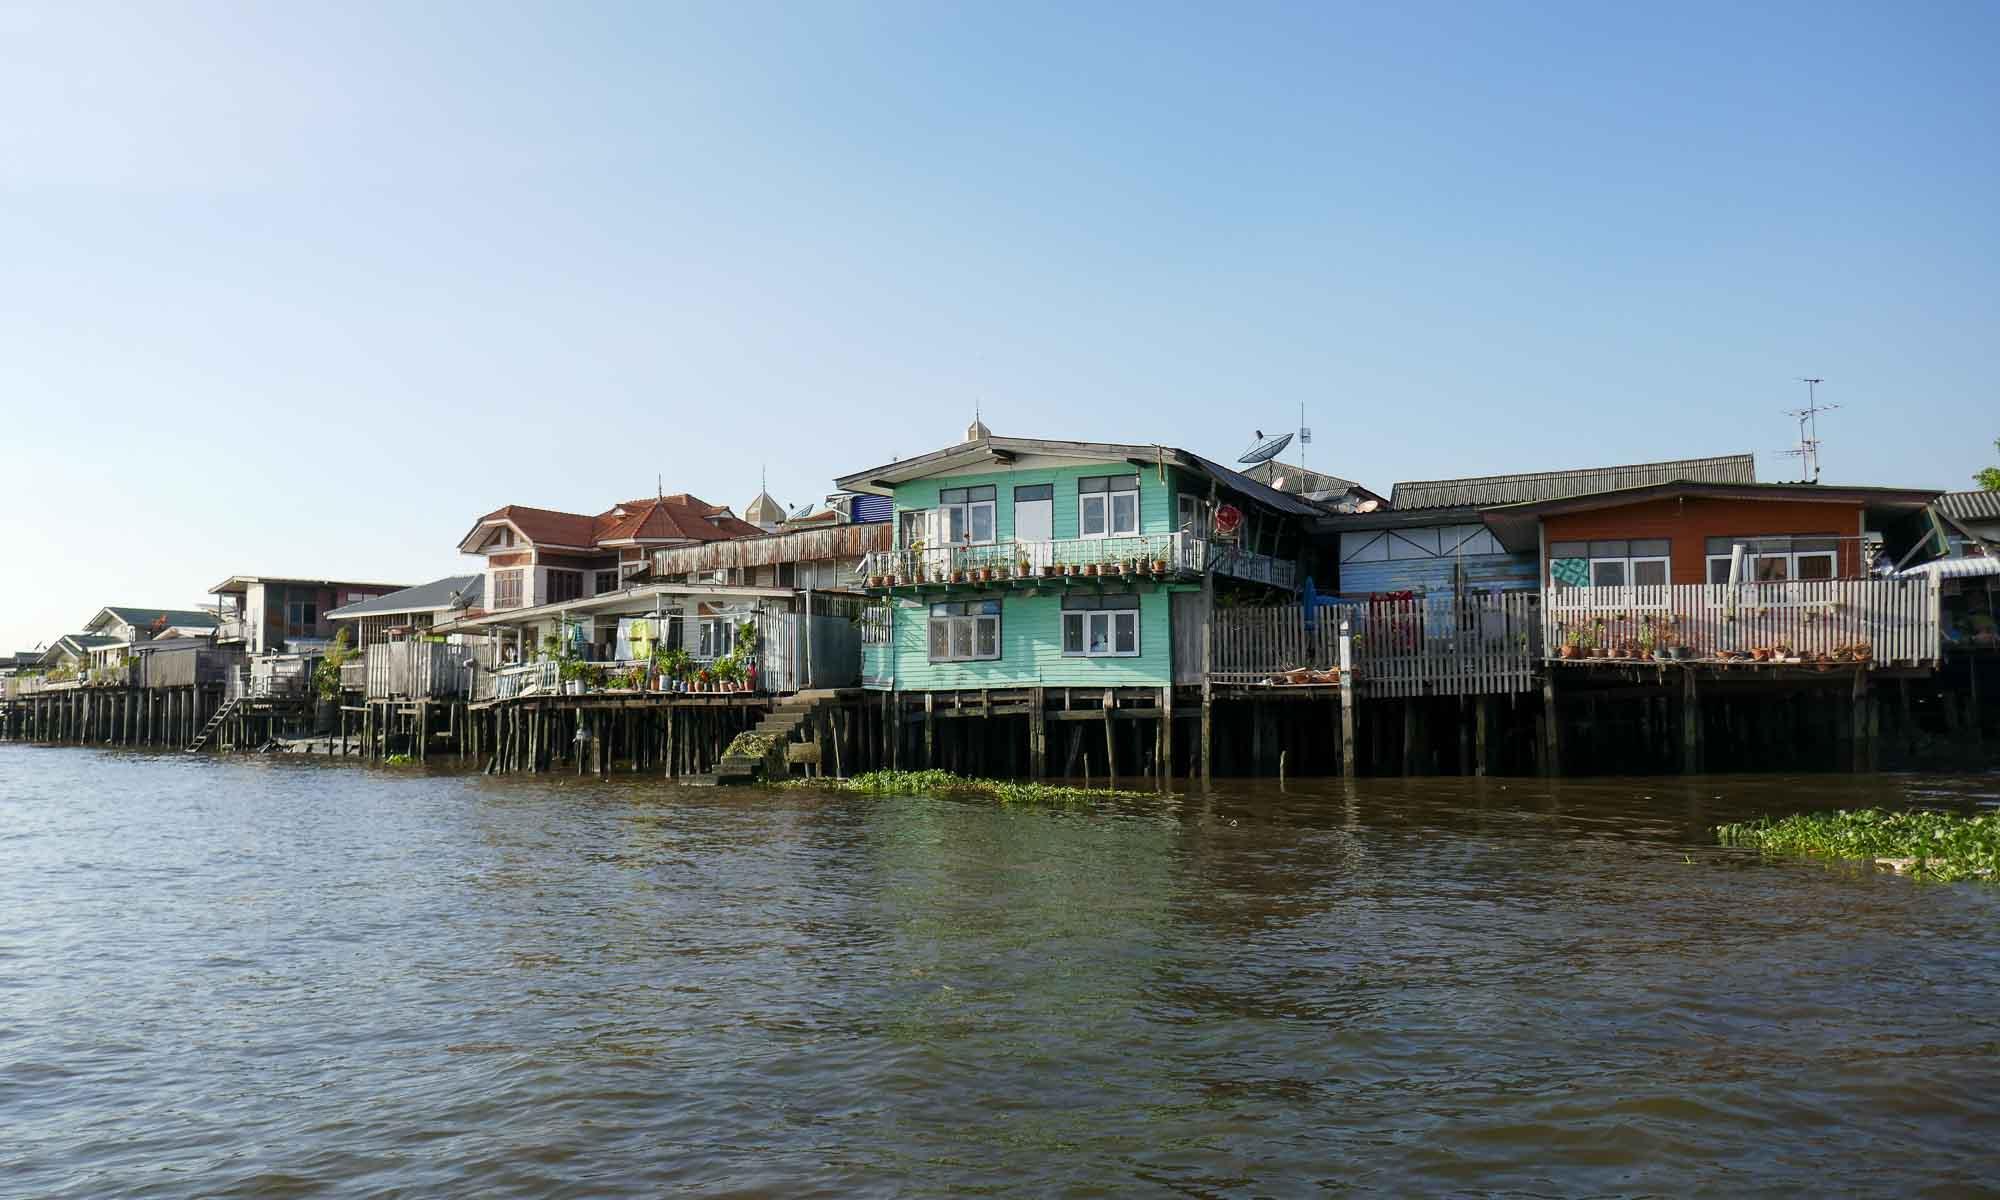 Stilt houses further up the river